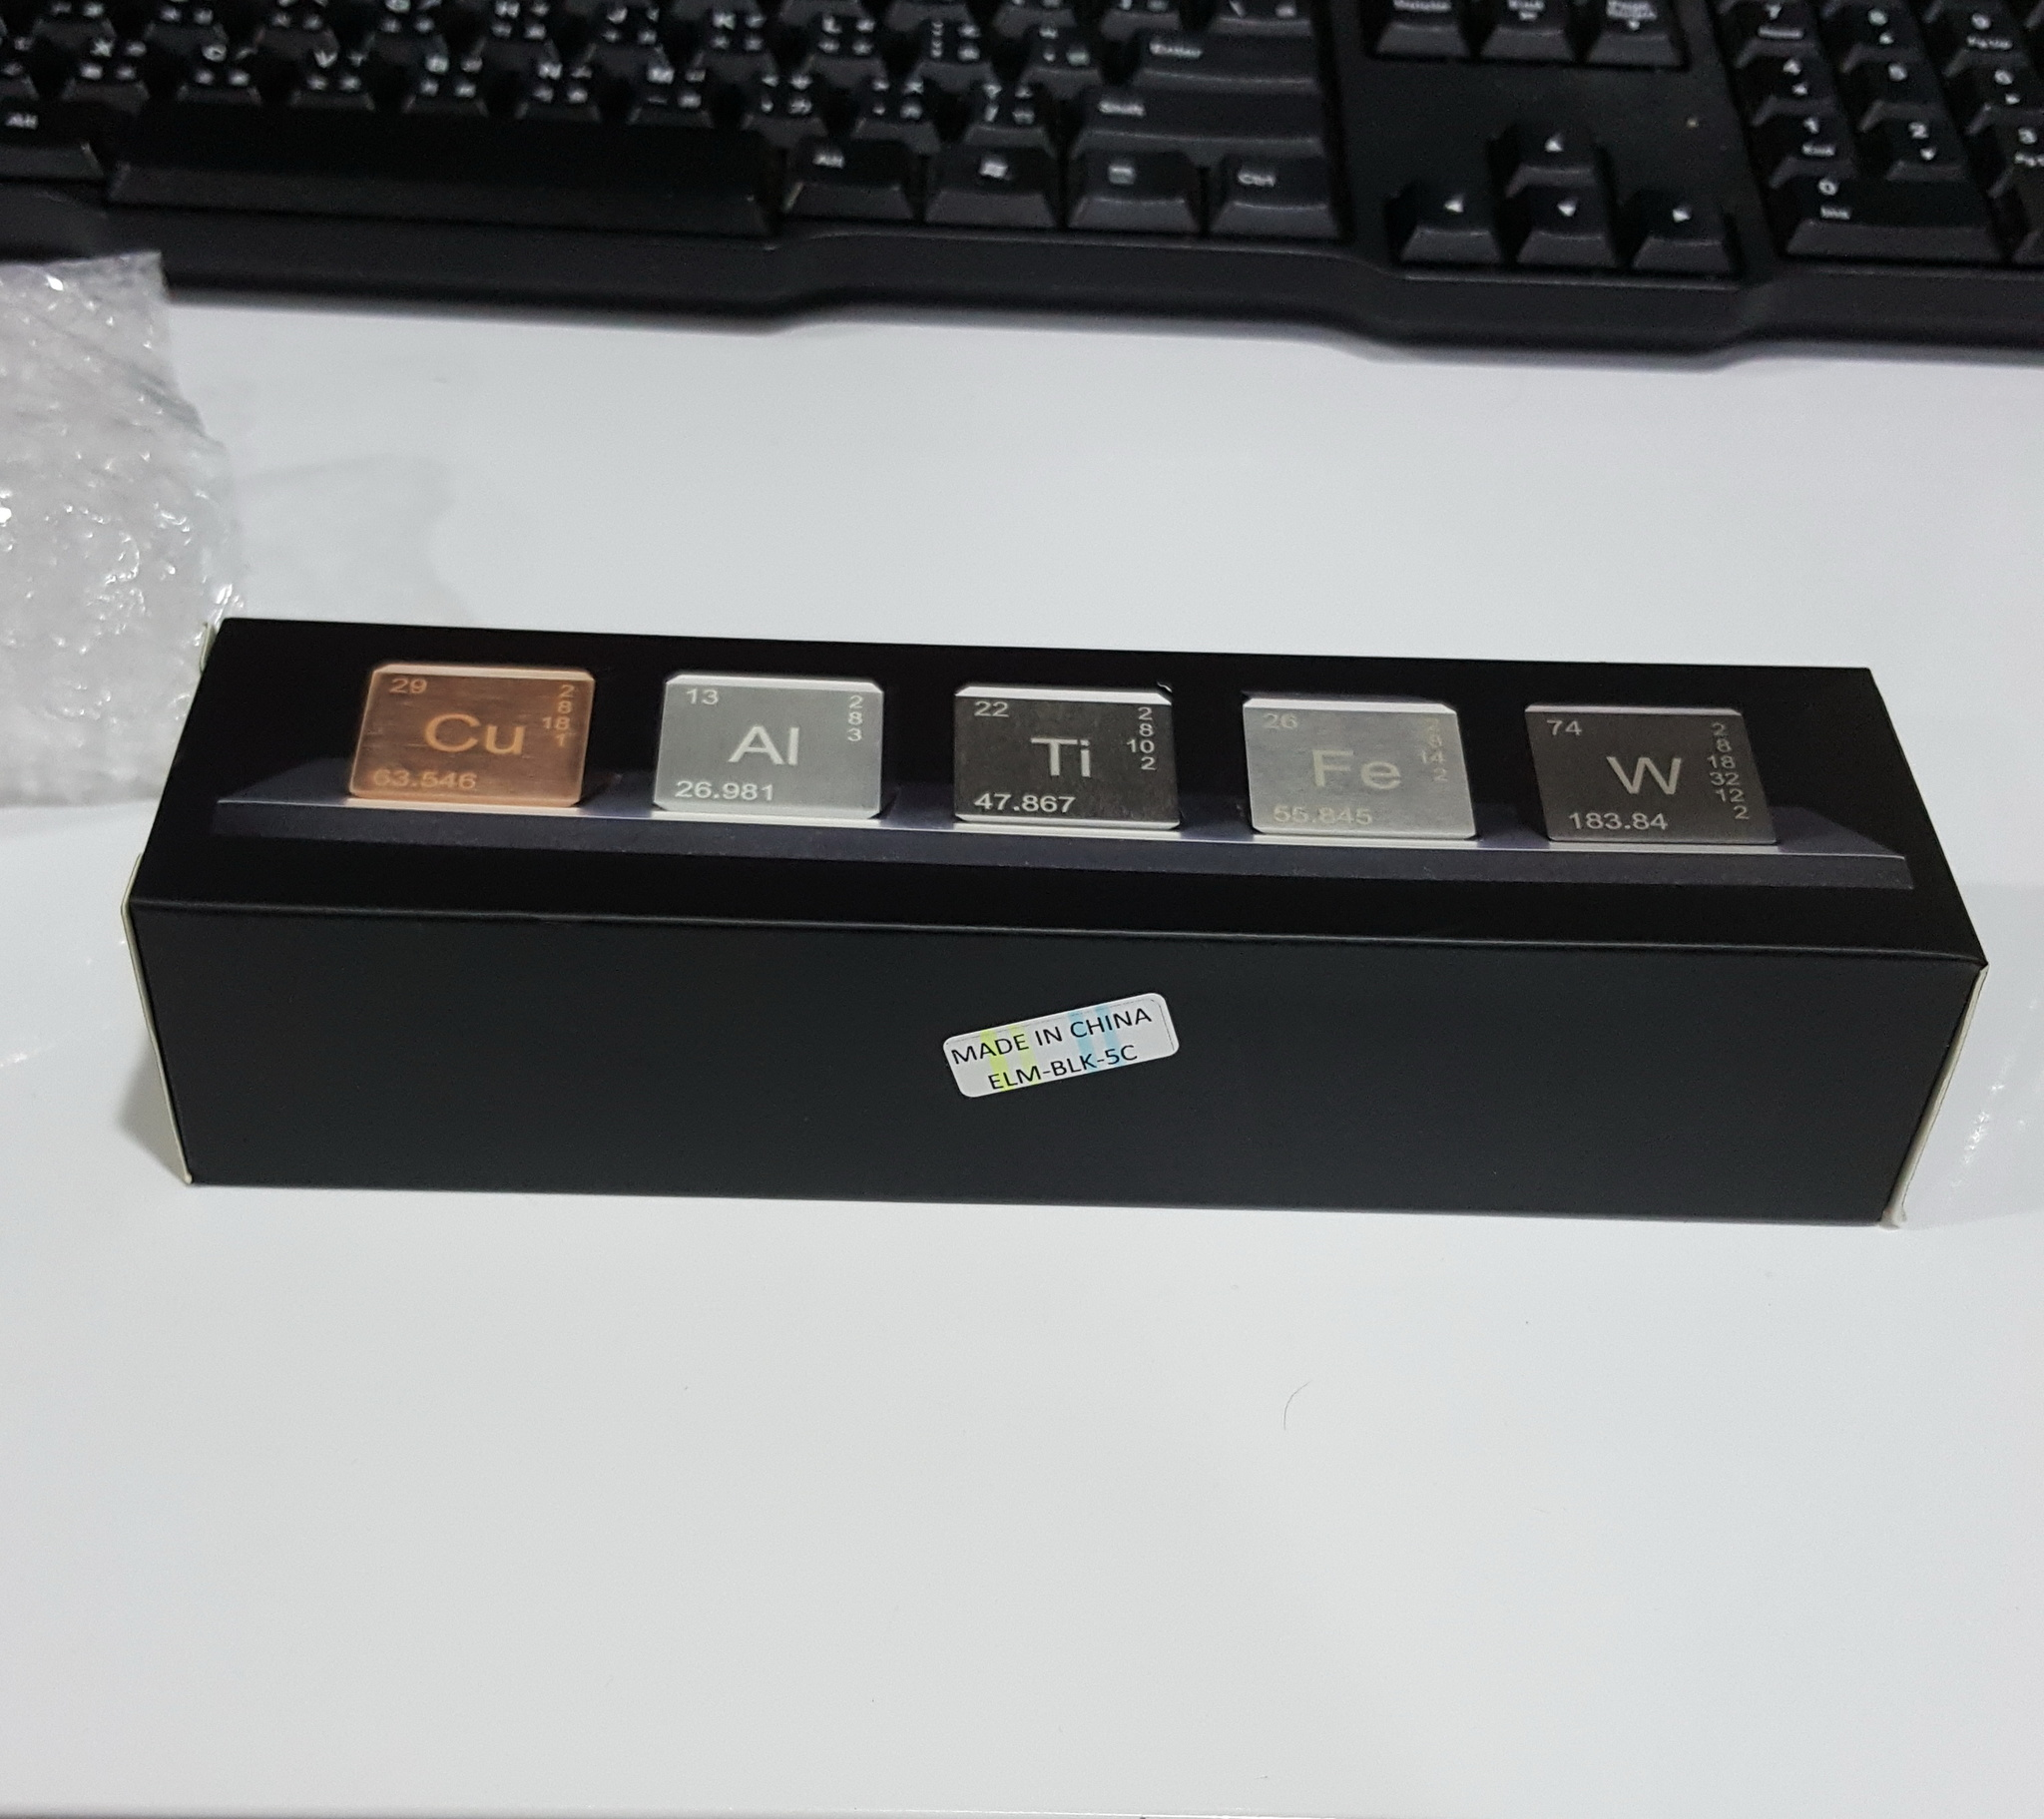 【Muffin歐文】 說 【Elements Cube】終於送到啦~~~還以為送貨人員看不懂英文地址路上寄丟了 盒子外觀......那個MIC ...